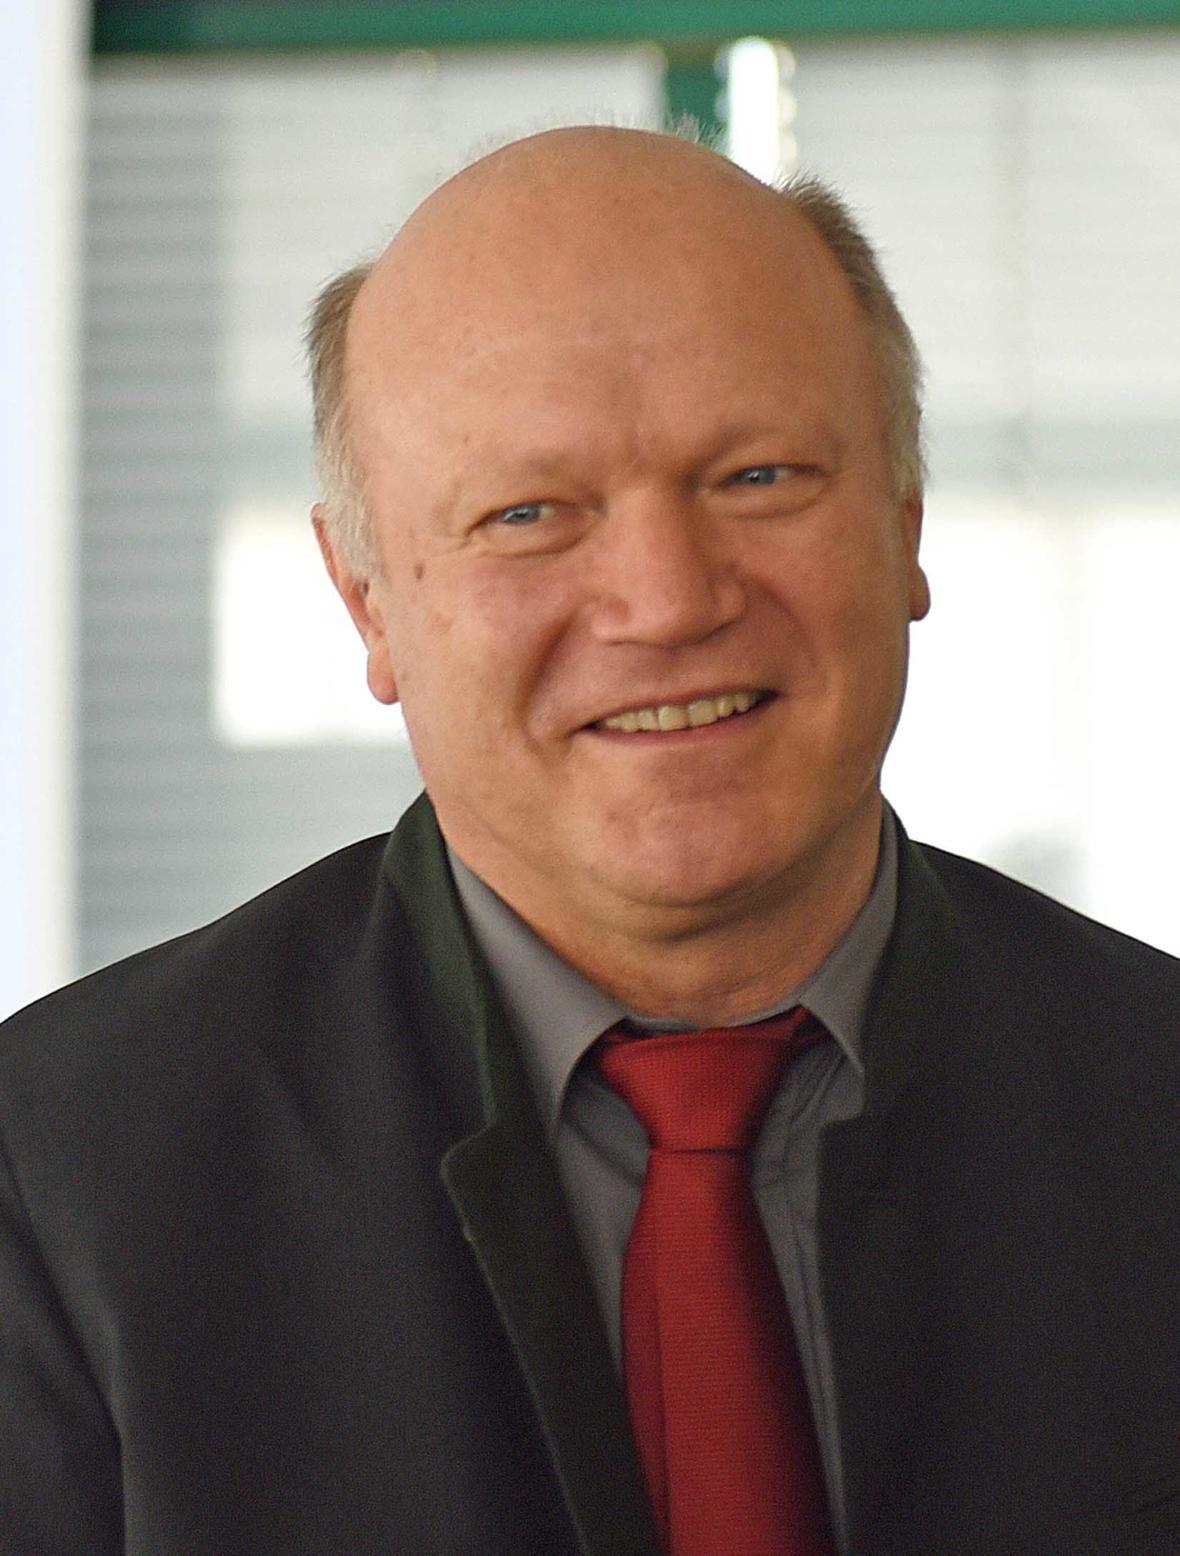 Diakon Franz Schütz, Leiter der Telefonseelsorge. (Foto: Daniel Jäckel / pba)